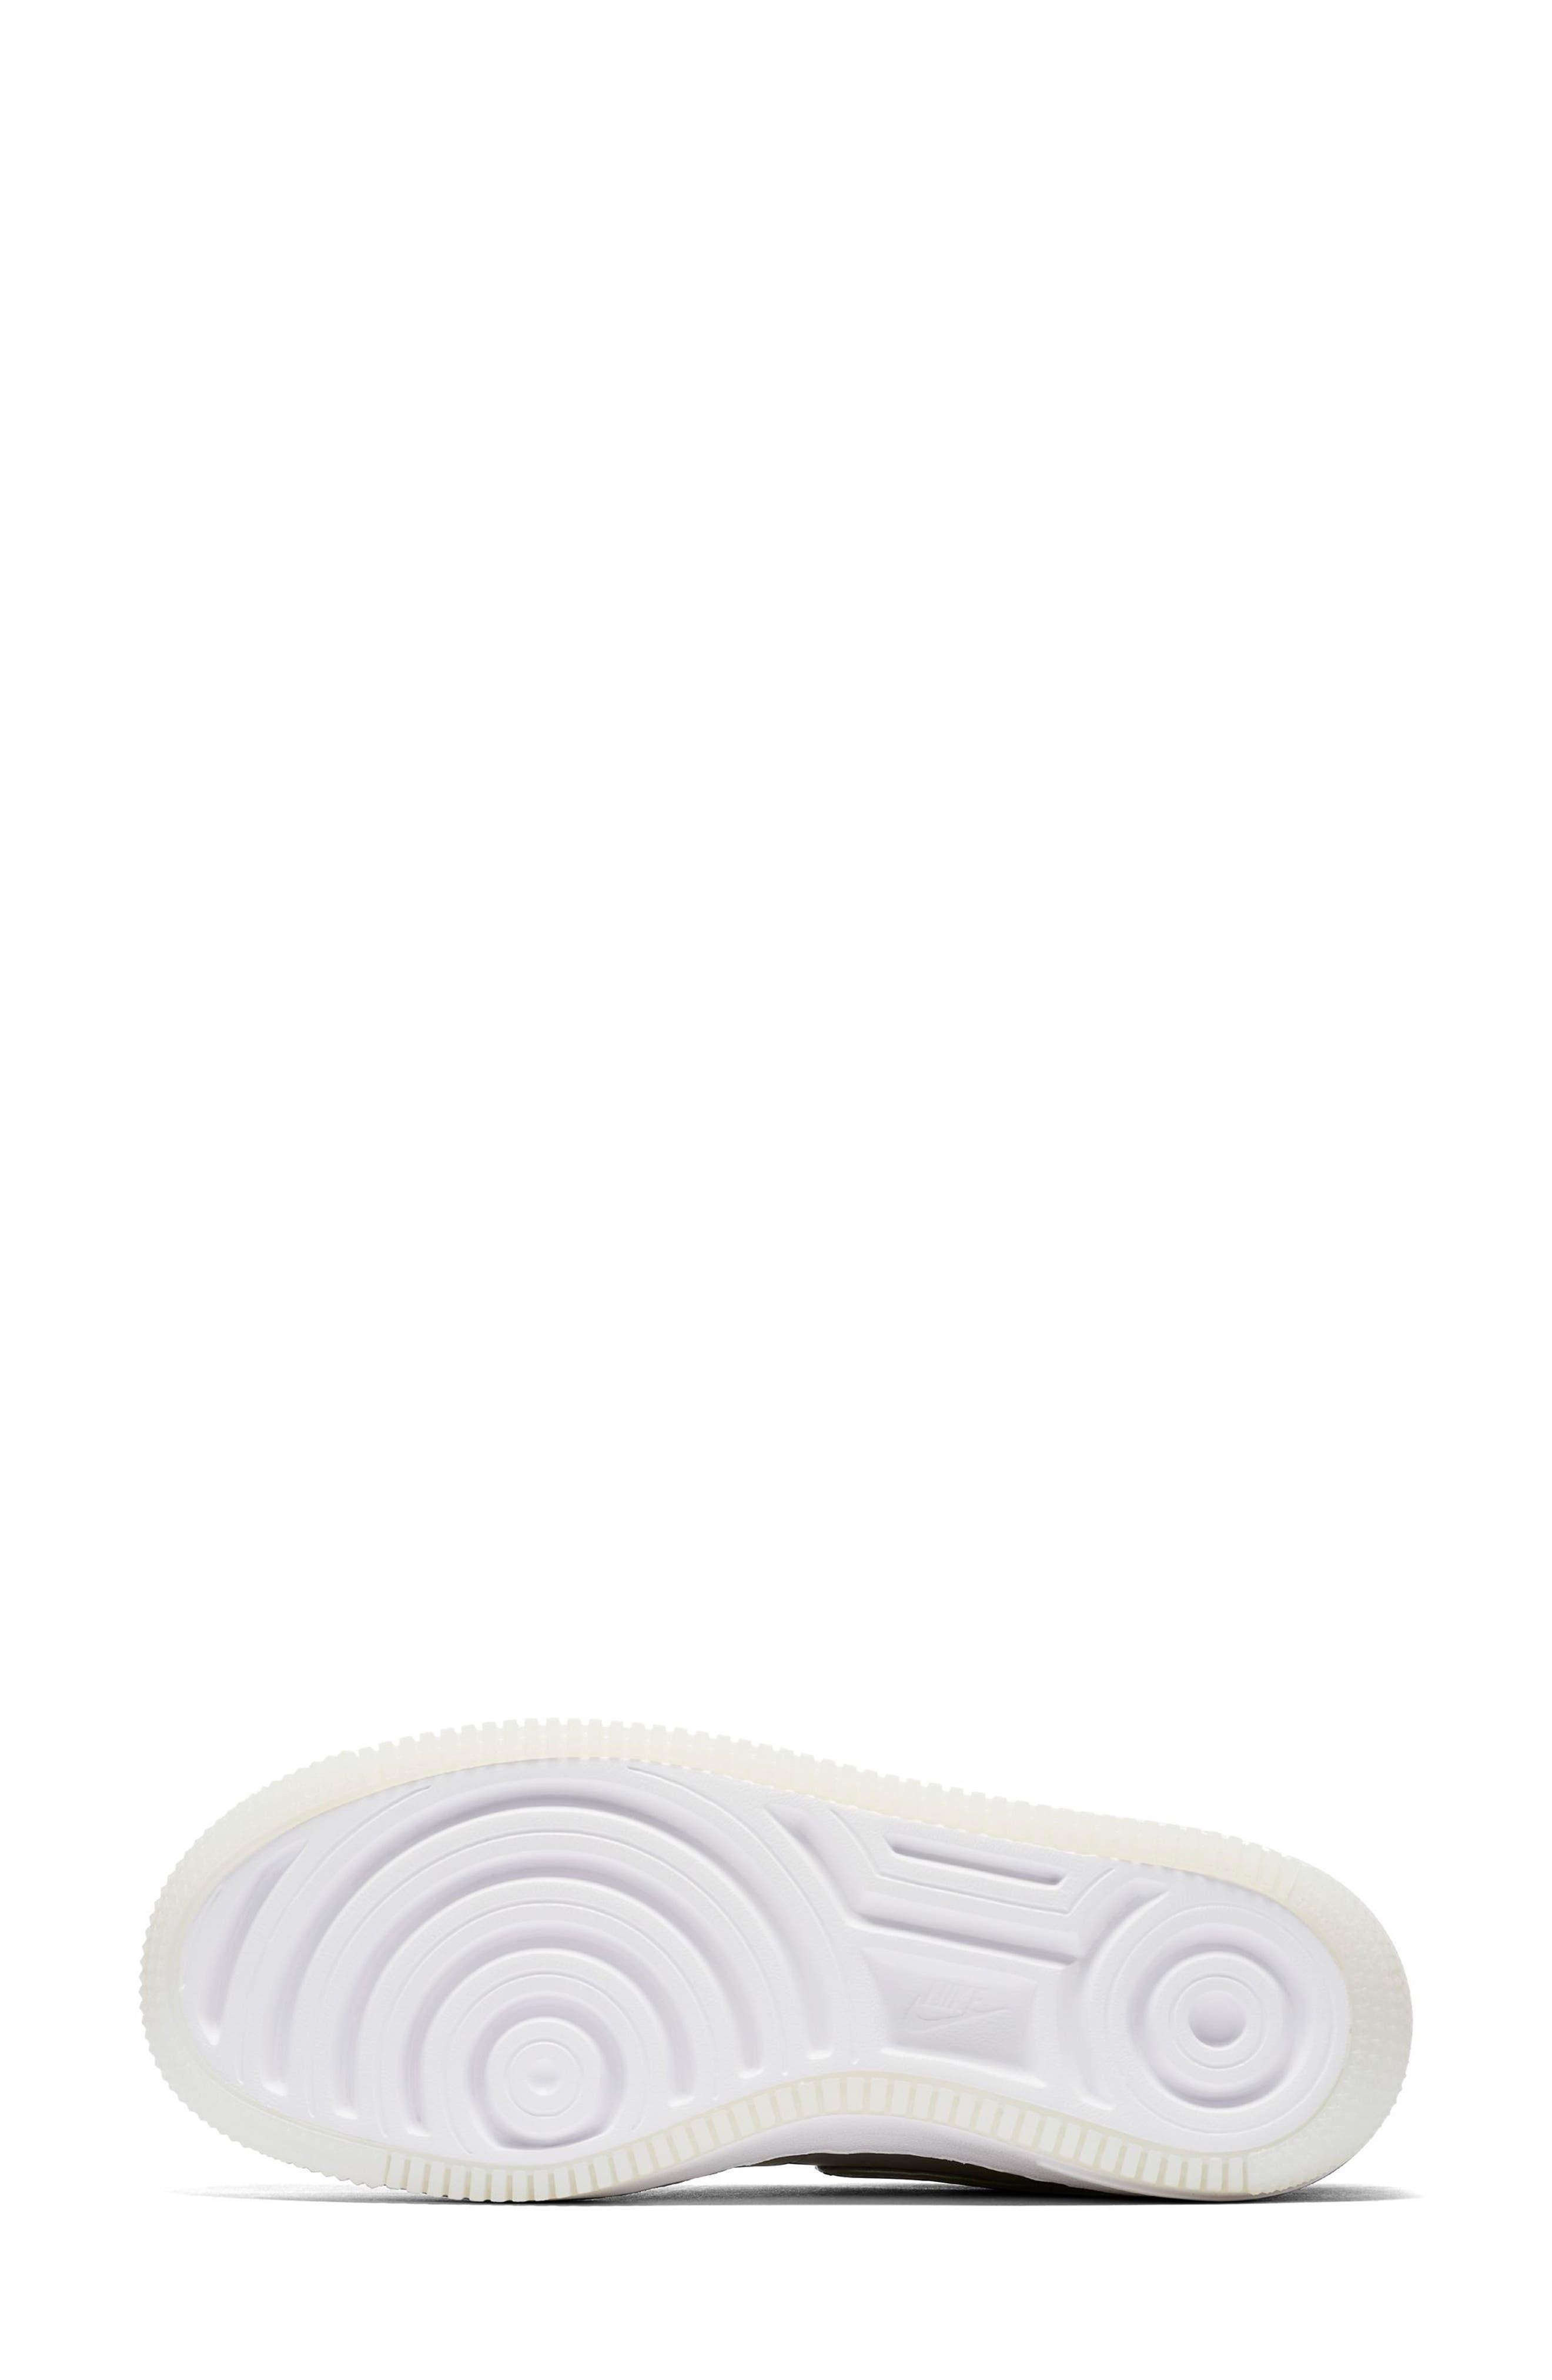 Air Force 1 Upstep Premium LX Shoe,                             Alternate thumbnail 7, color,                             Dark Stucco/ Stucco/ White